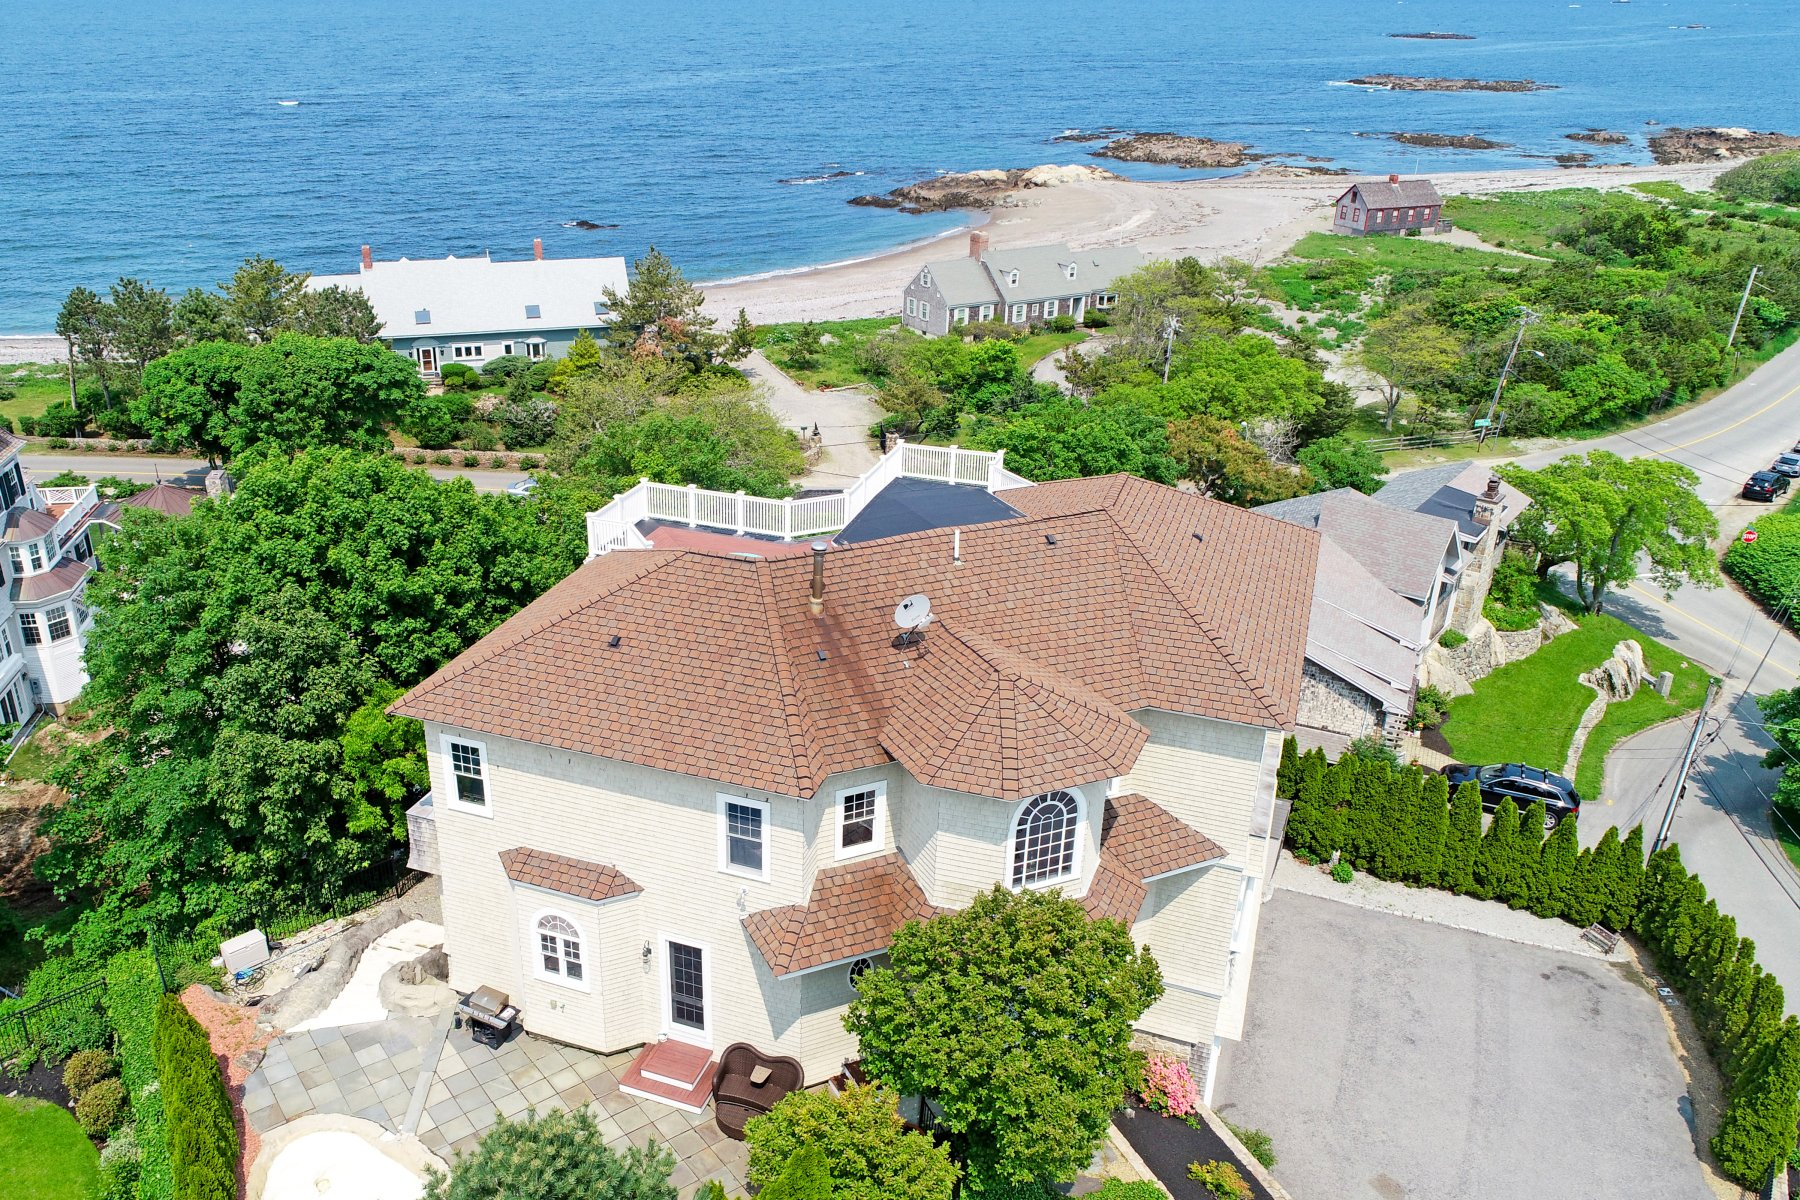 Single Family Homes for Active at 3 Jerusalem Lane Cohasset, Massachusetts 02025 United States